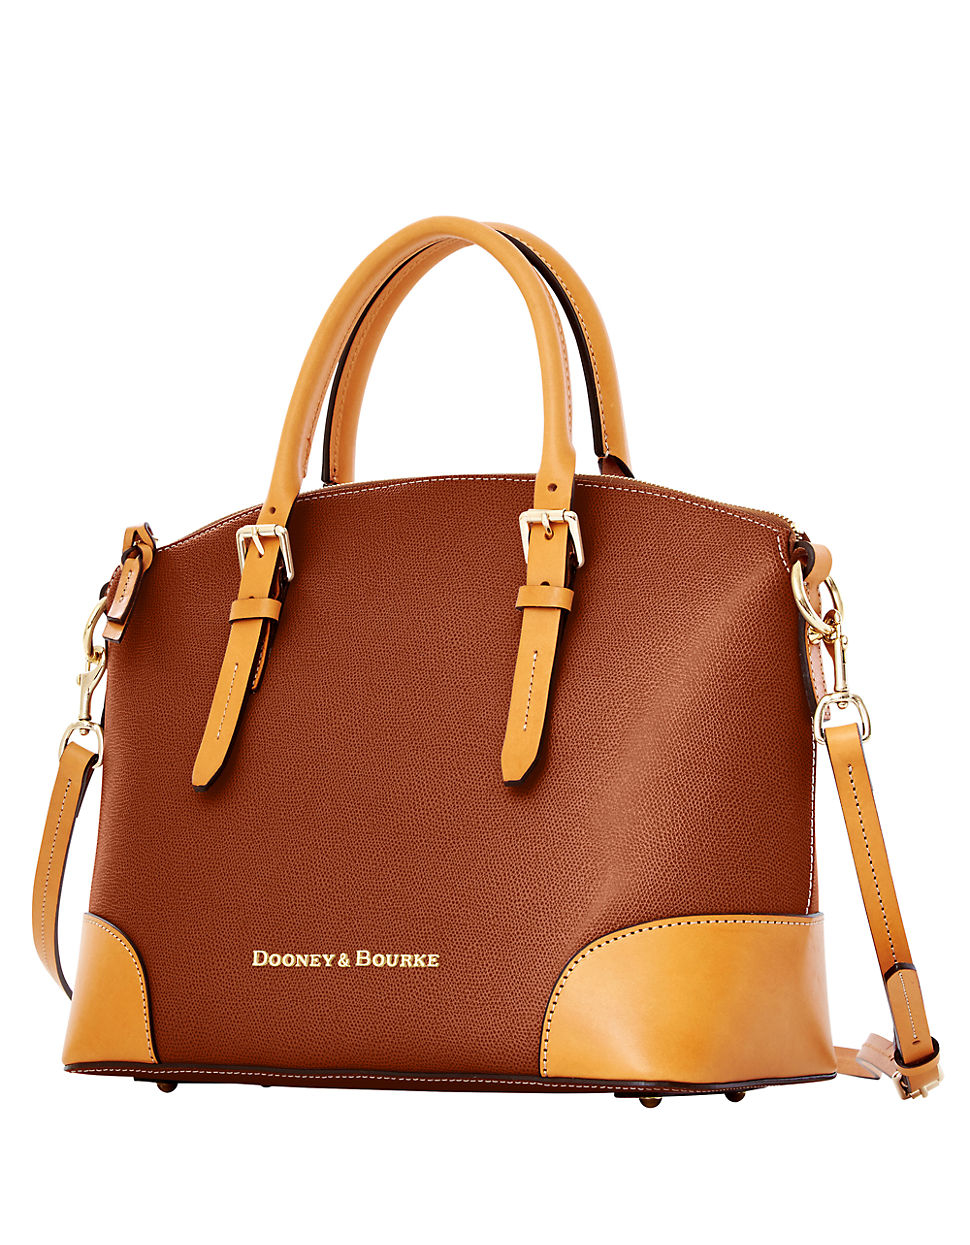 Lyst - Dooney & Bourke Claremont Leather Dome Satchel Bag ...